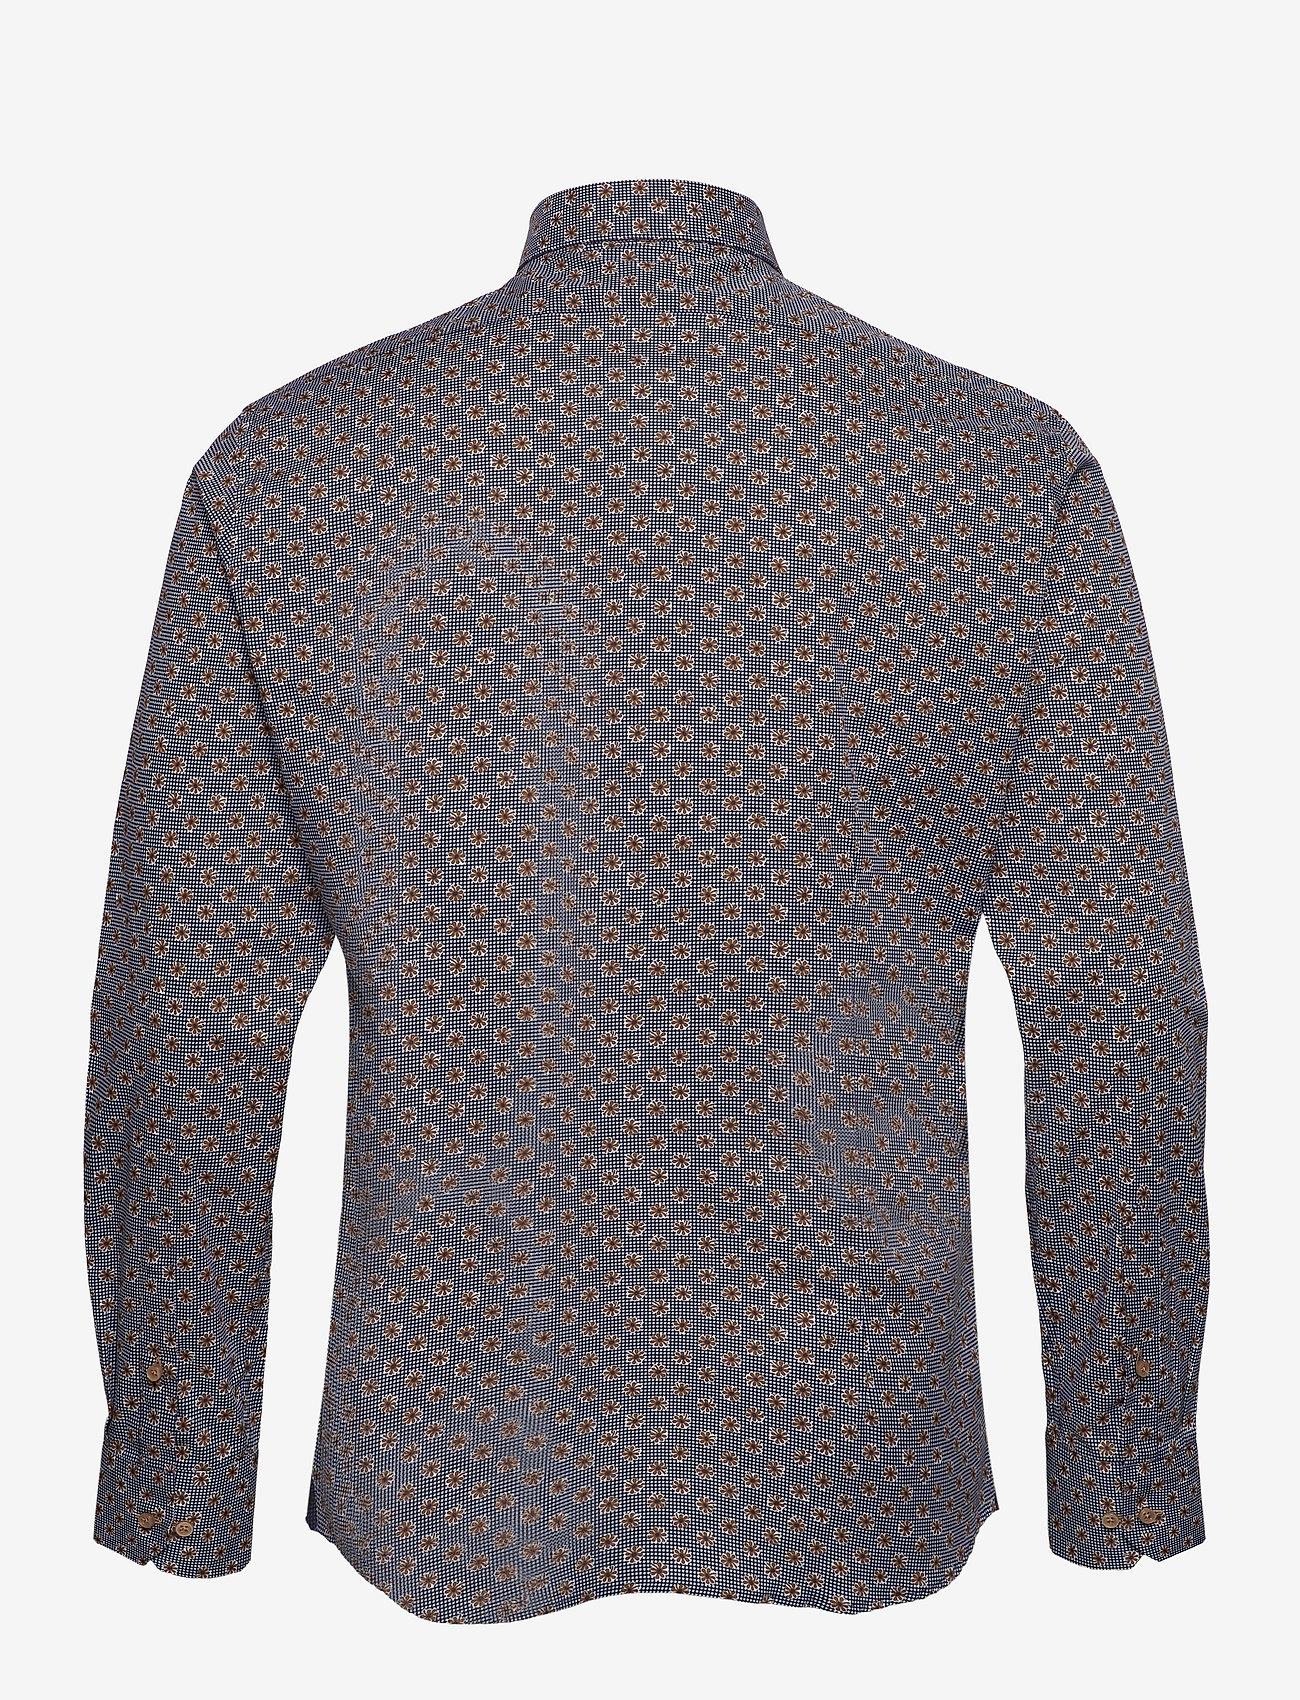 XO Shirtmaker by Sand Copenhagen - 8667 - Gordon SC - business skjortor - dark camel - 1